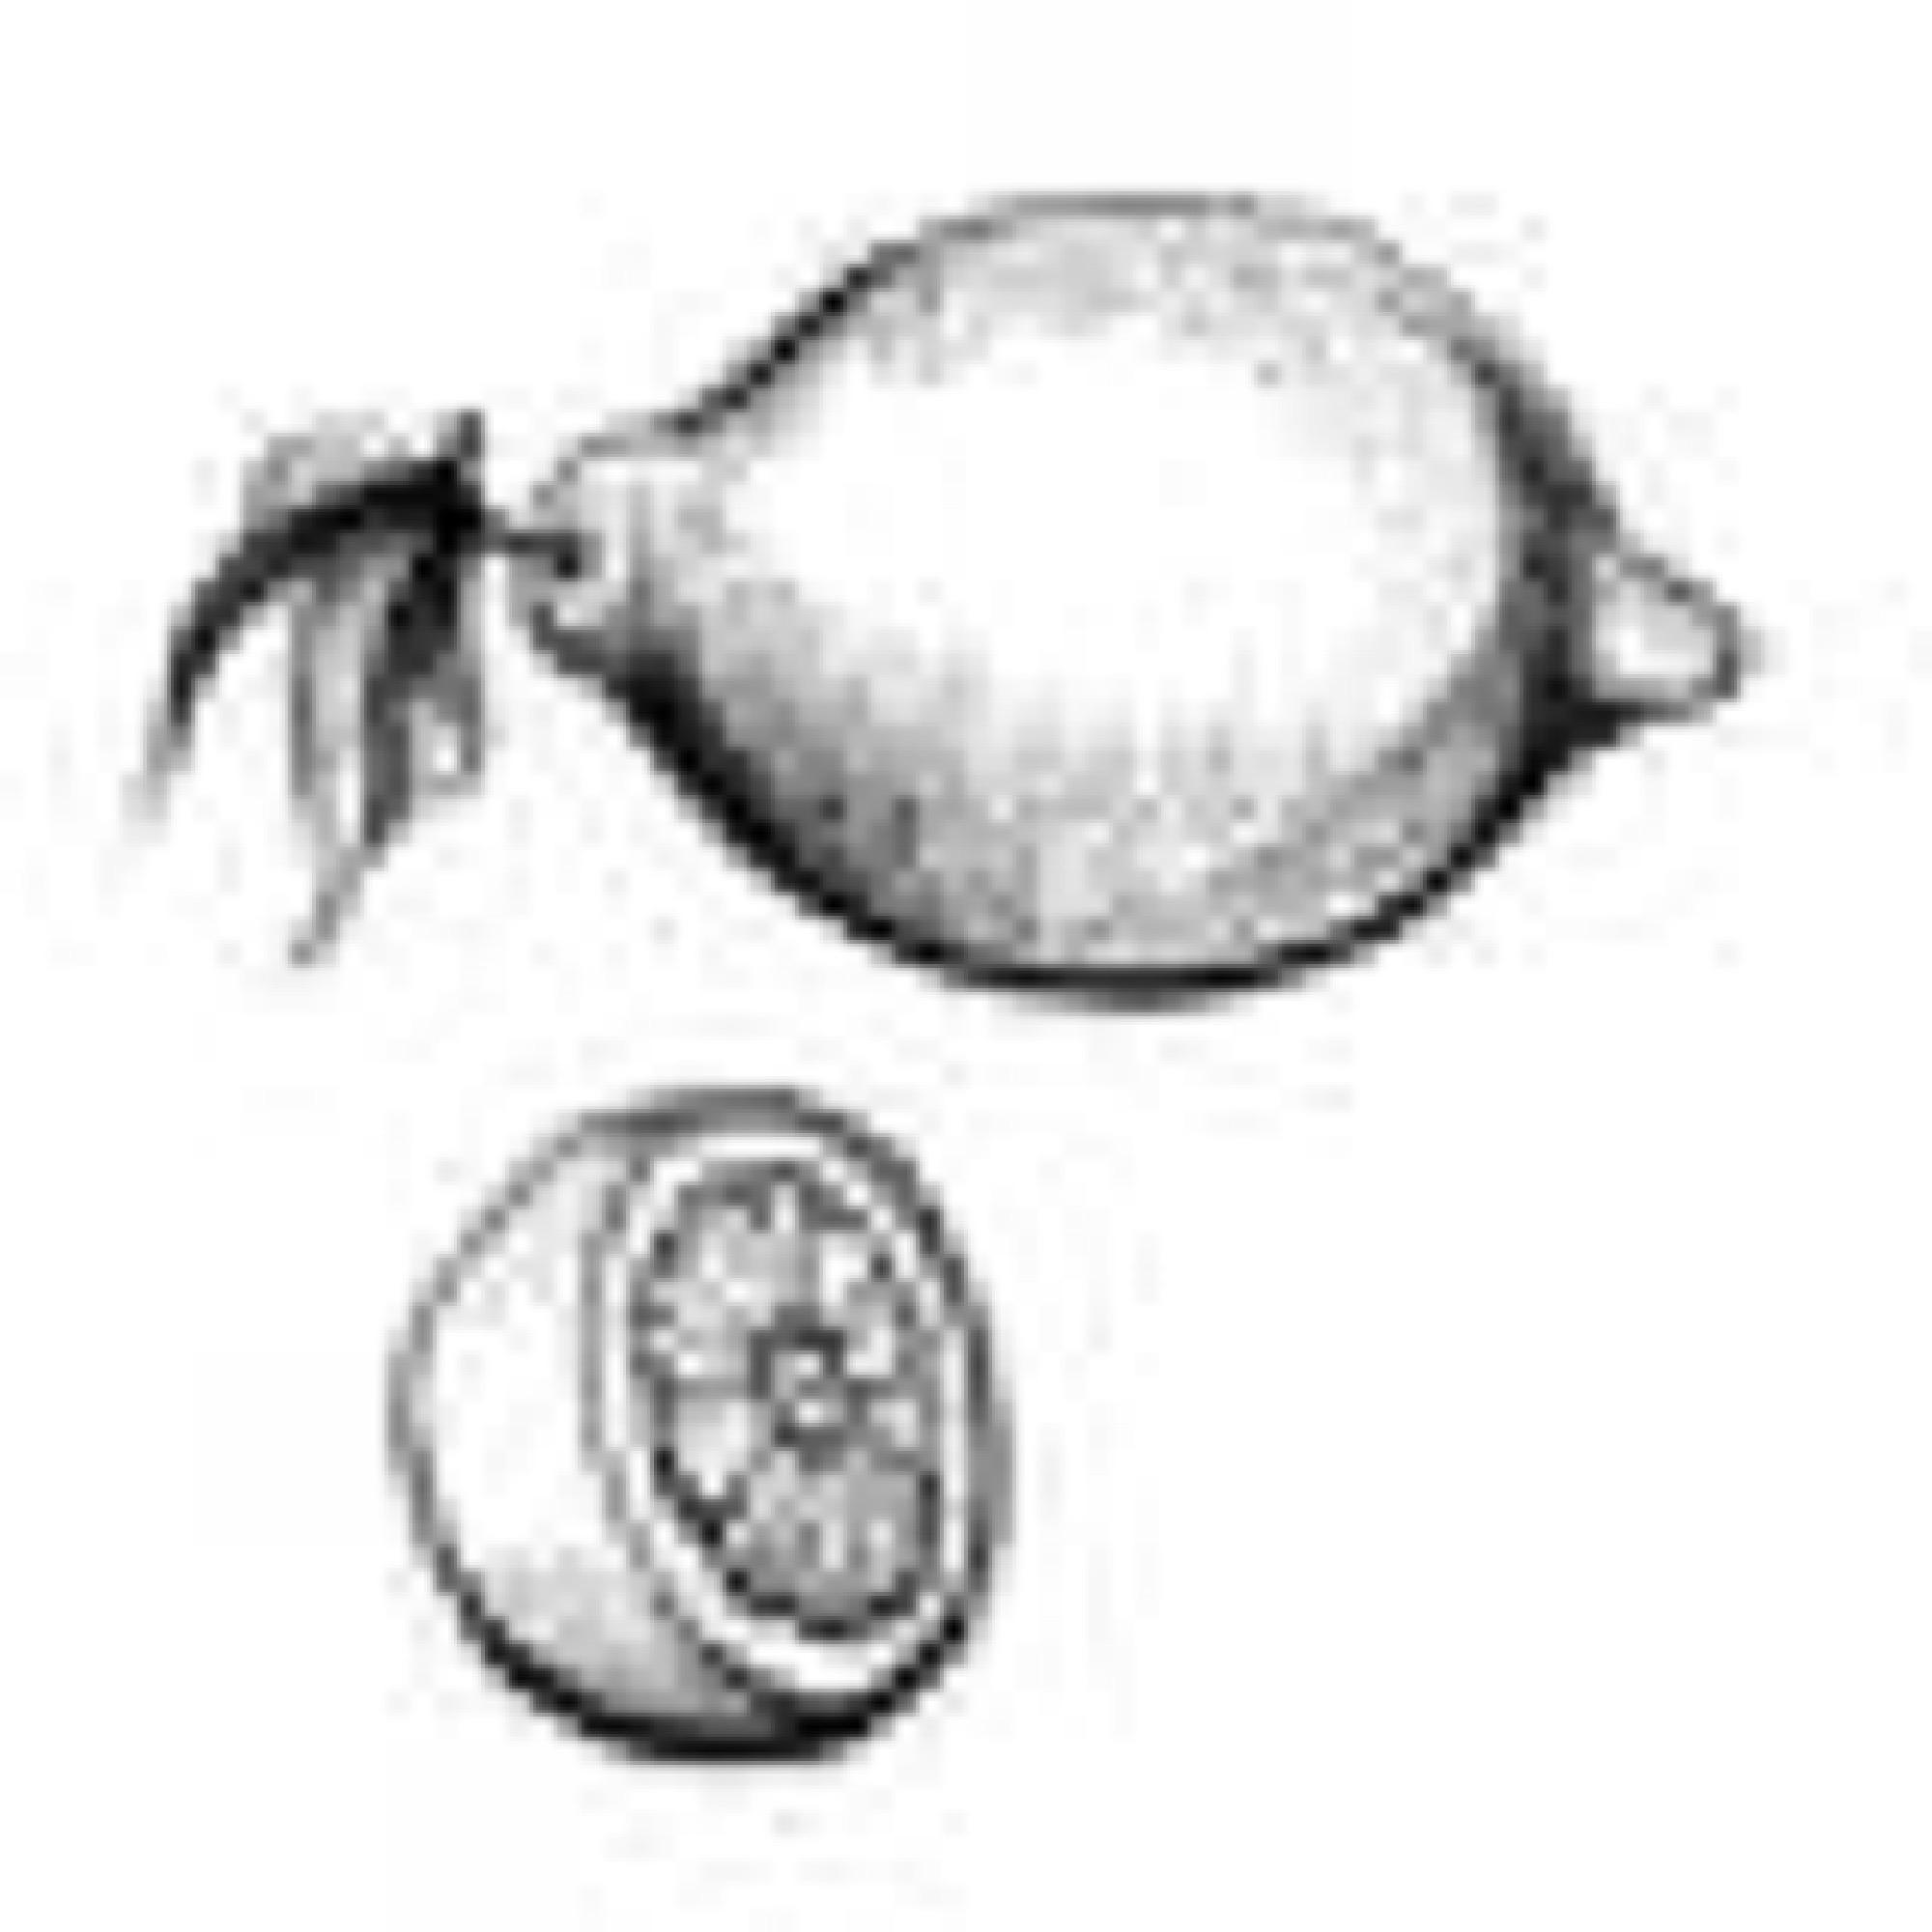 ica ratt enkelt citroner sagamariah